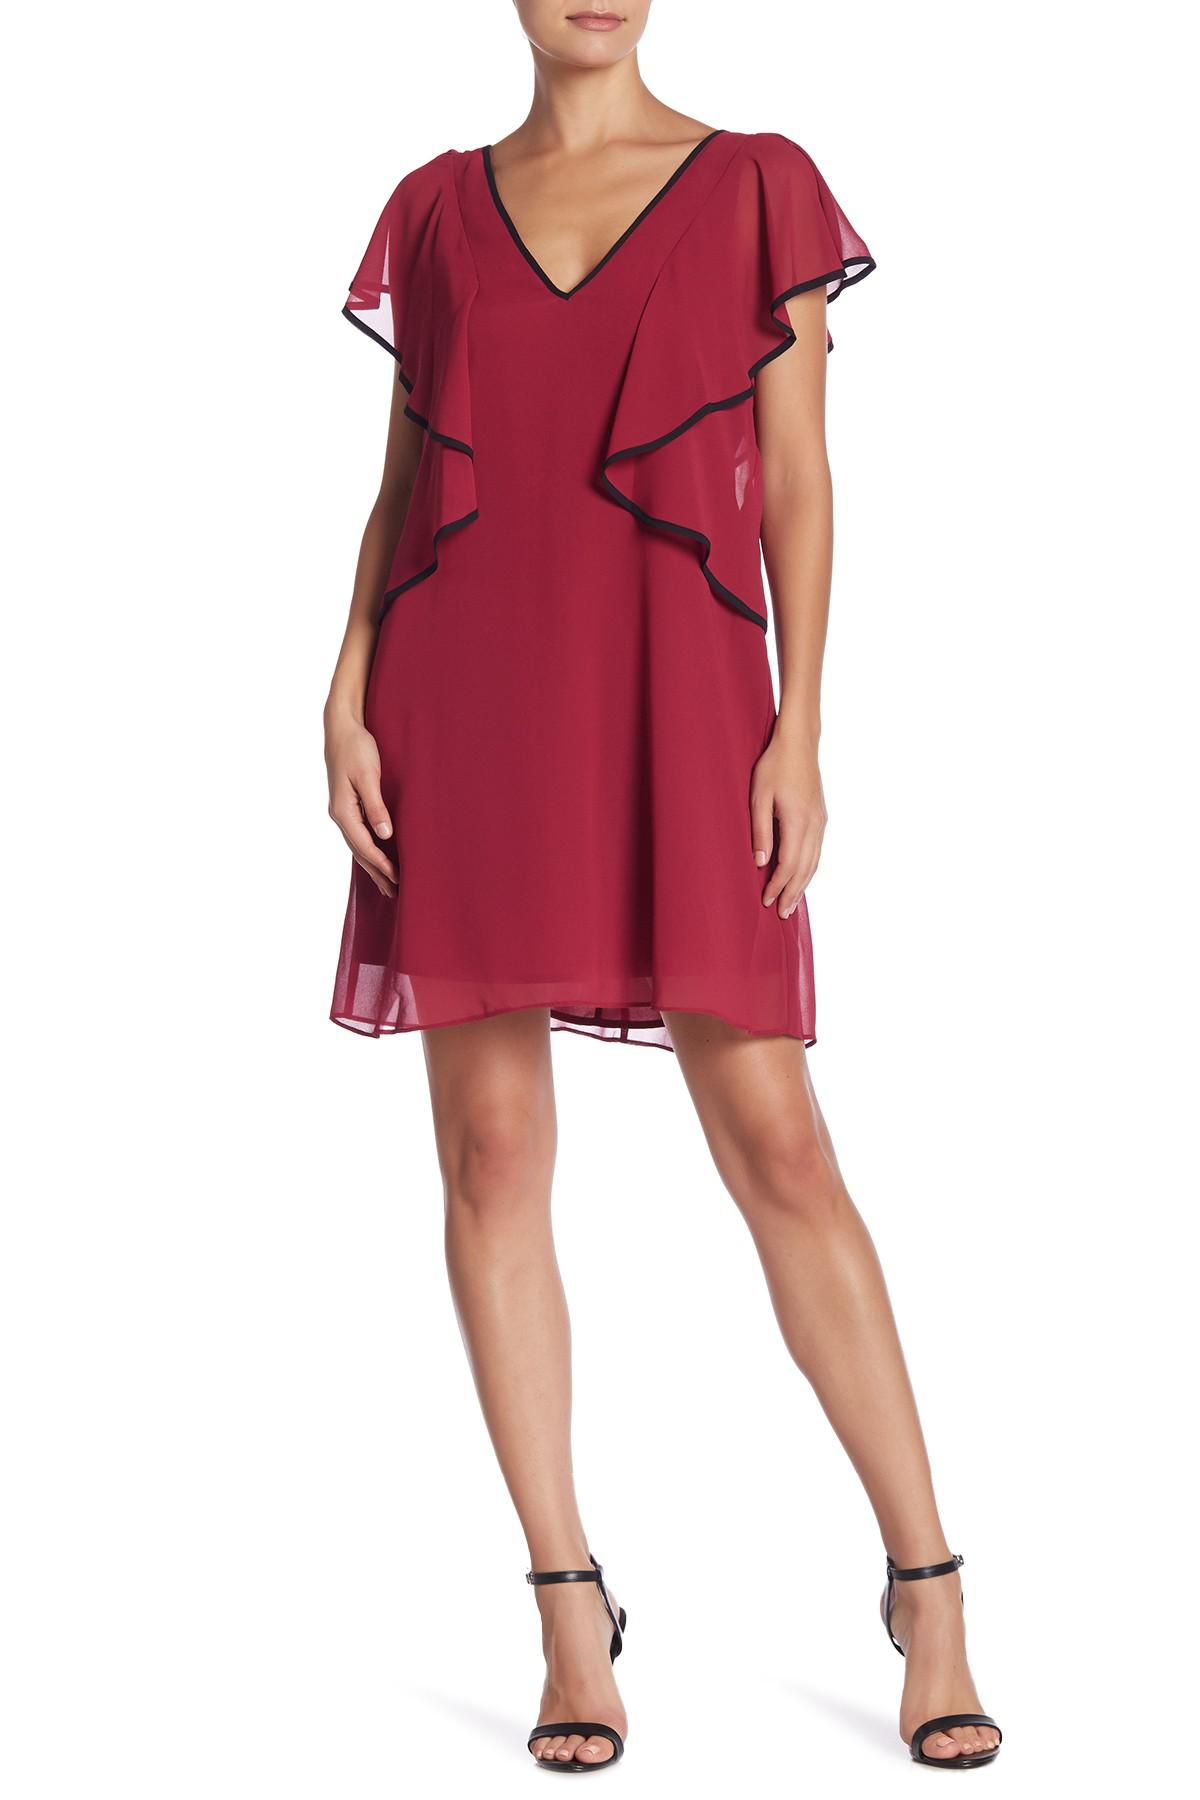 d3fe7c809 BCBGeneration. Women's Red Ruffle Sleeve Dress. $98 $50 From Nordstrom Rack